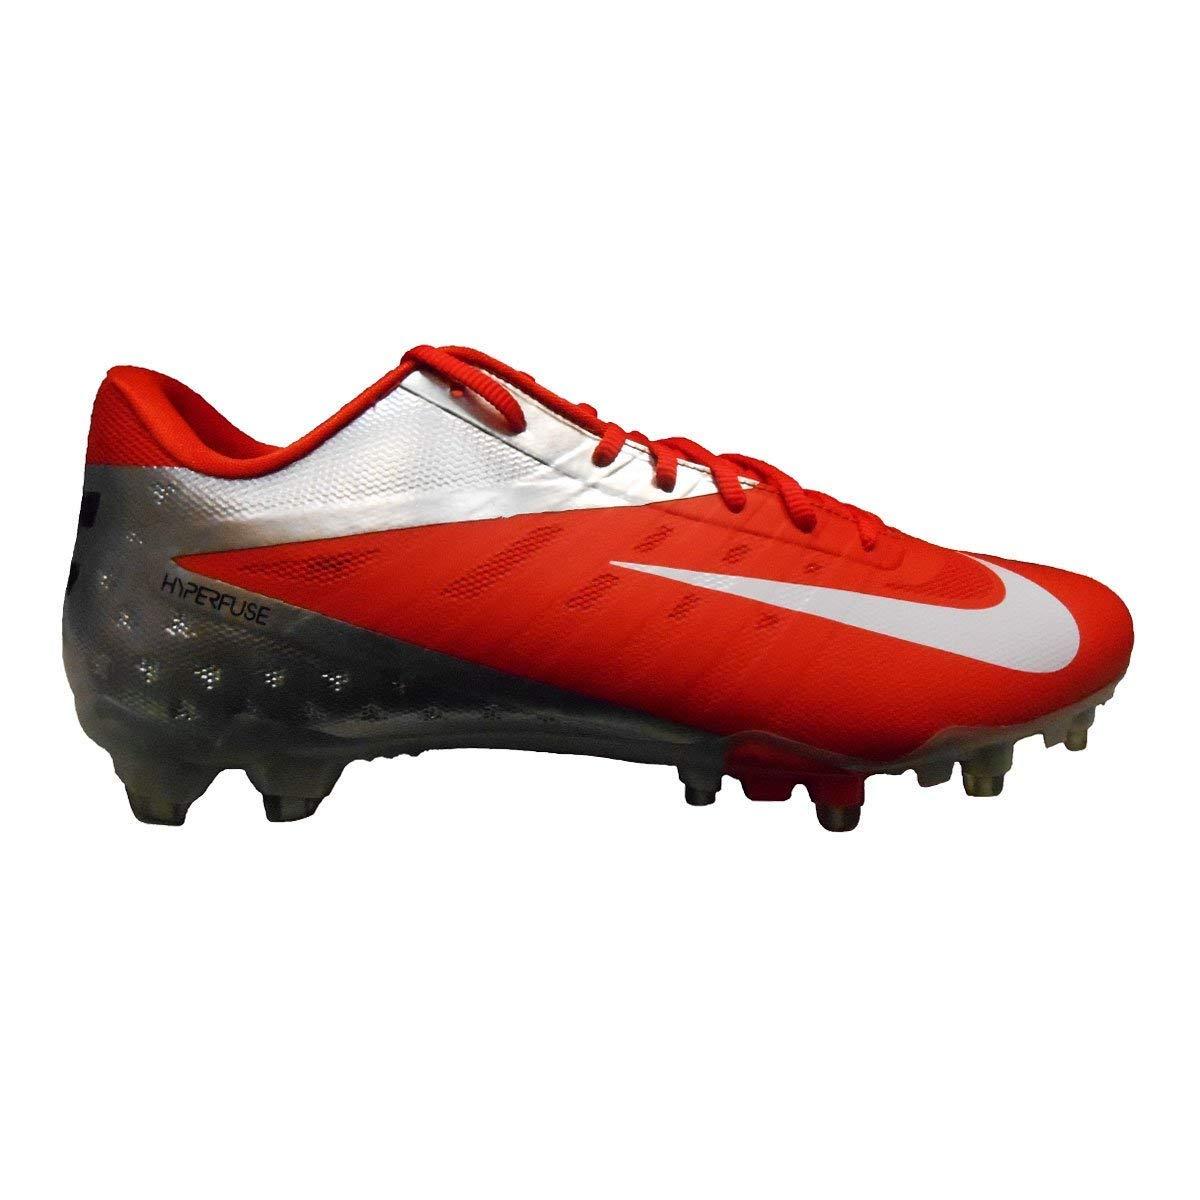 Nike Vapor Talon Elite Low TD Football Cleats